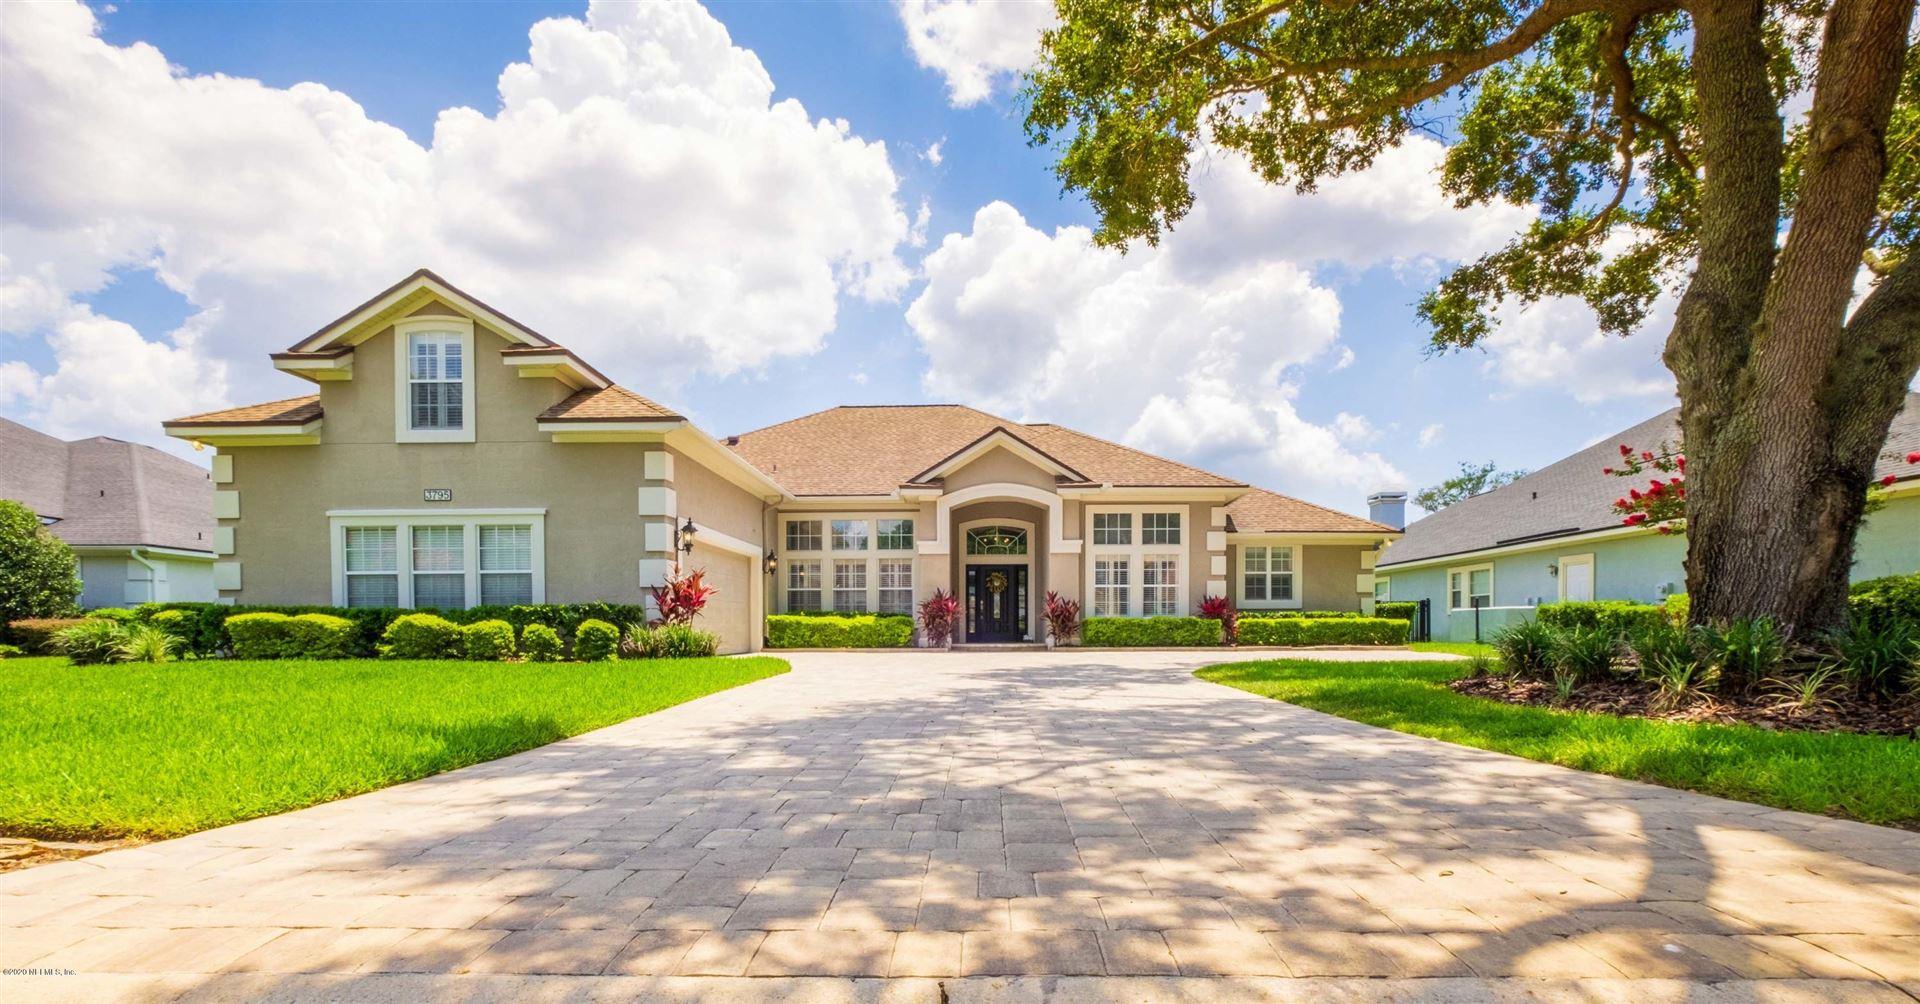 3795 BIGGIN CHURCH RD W, Jacksonville, FL 32224 - MLS#: 1063453